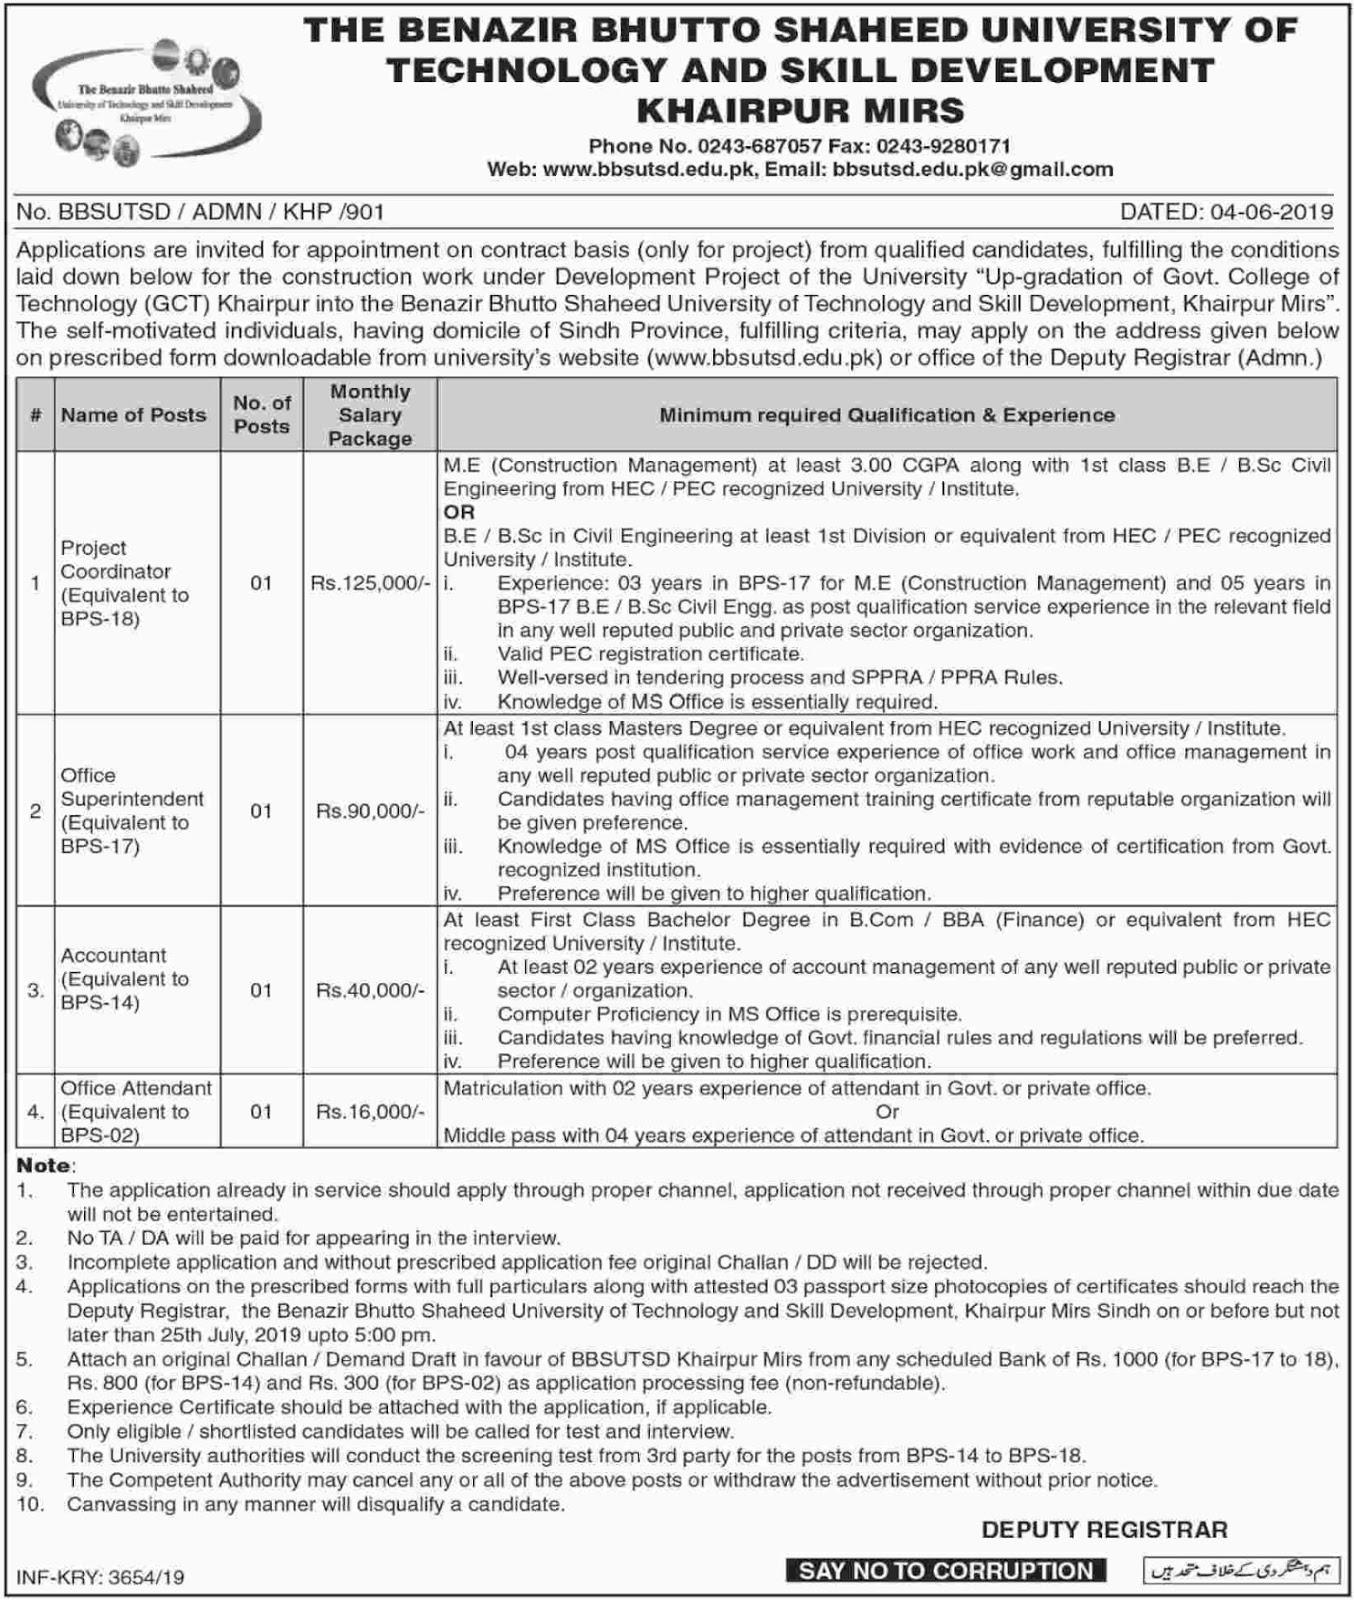 Benazir Bhutto Shaheed University of Technology and Skill Development BBSUTSD Khairpur Mirs Jobs 2019 Sindh Latest